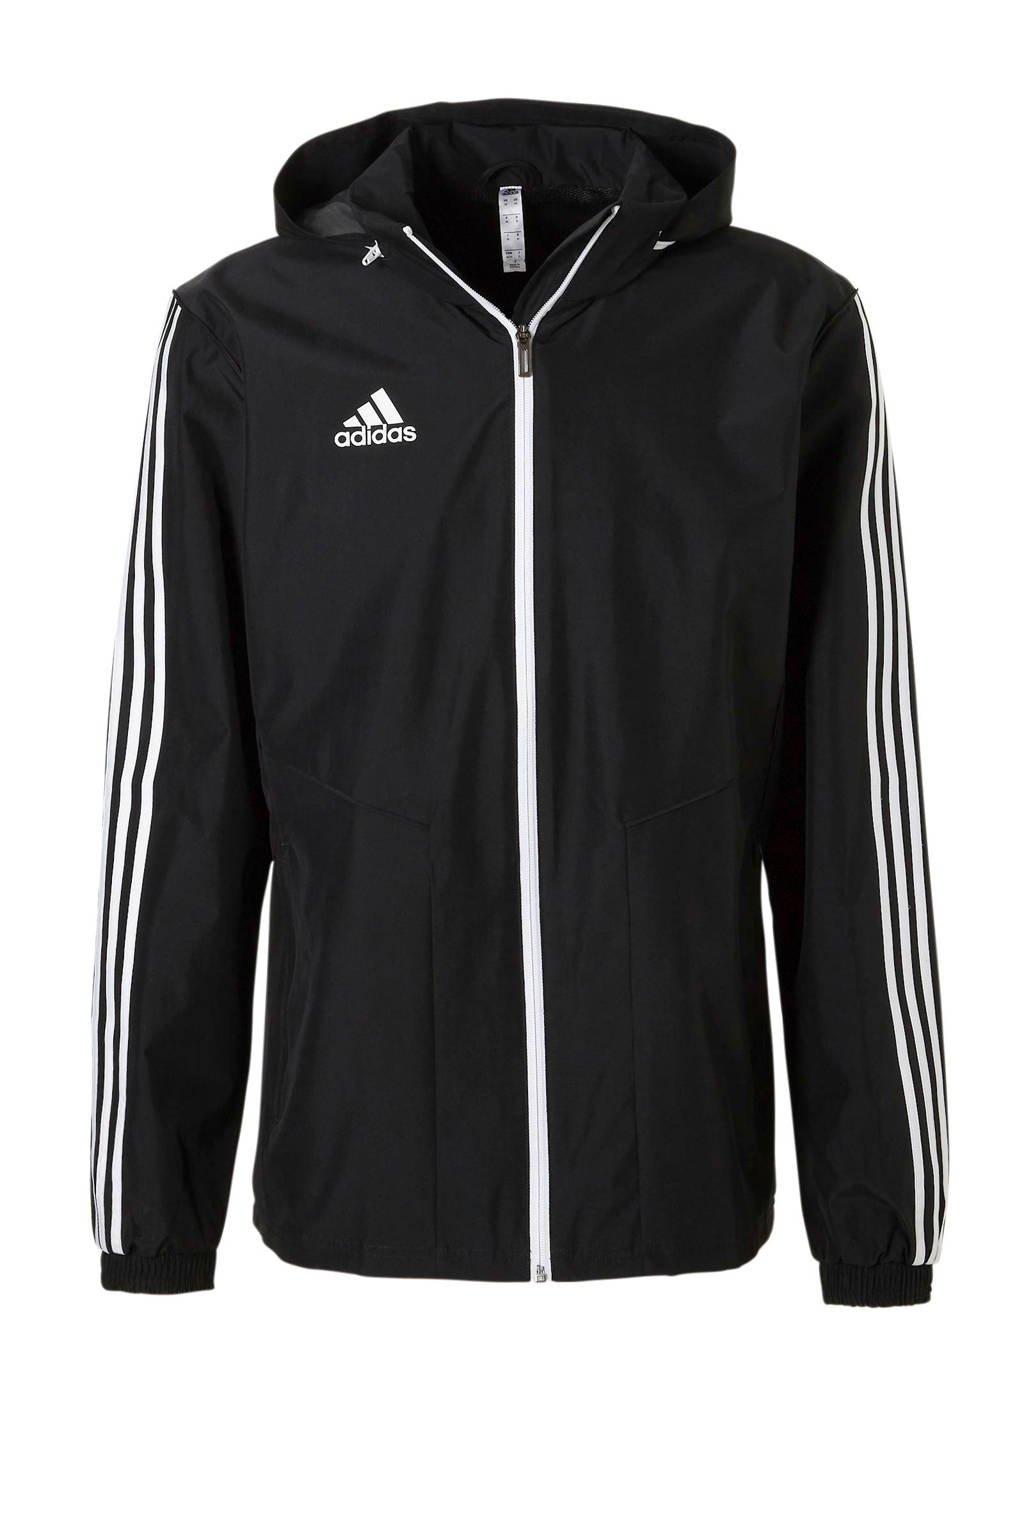 adidas Performance   sportjack Tiro 19 zwart, Zwart/wit